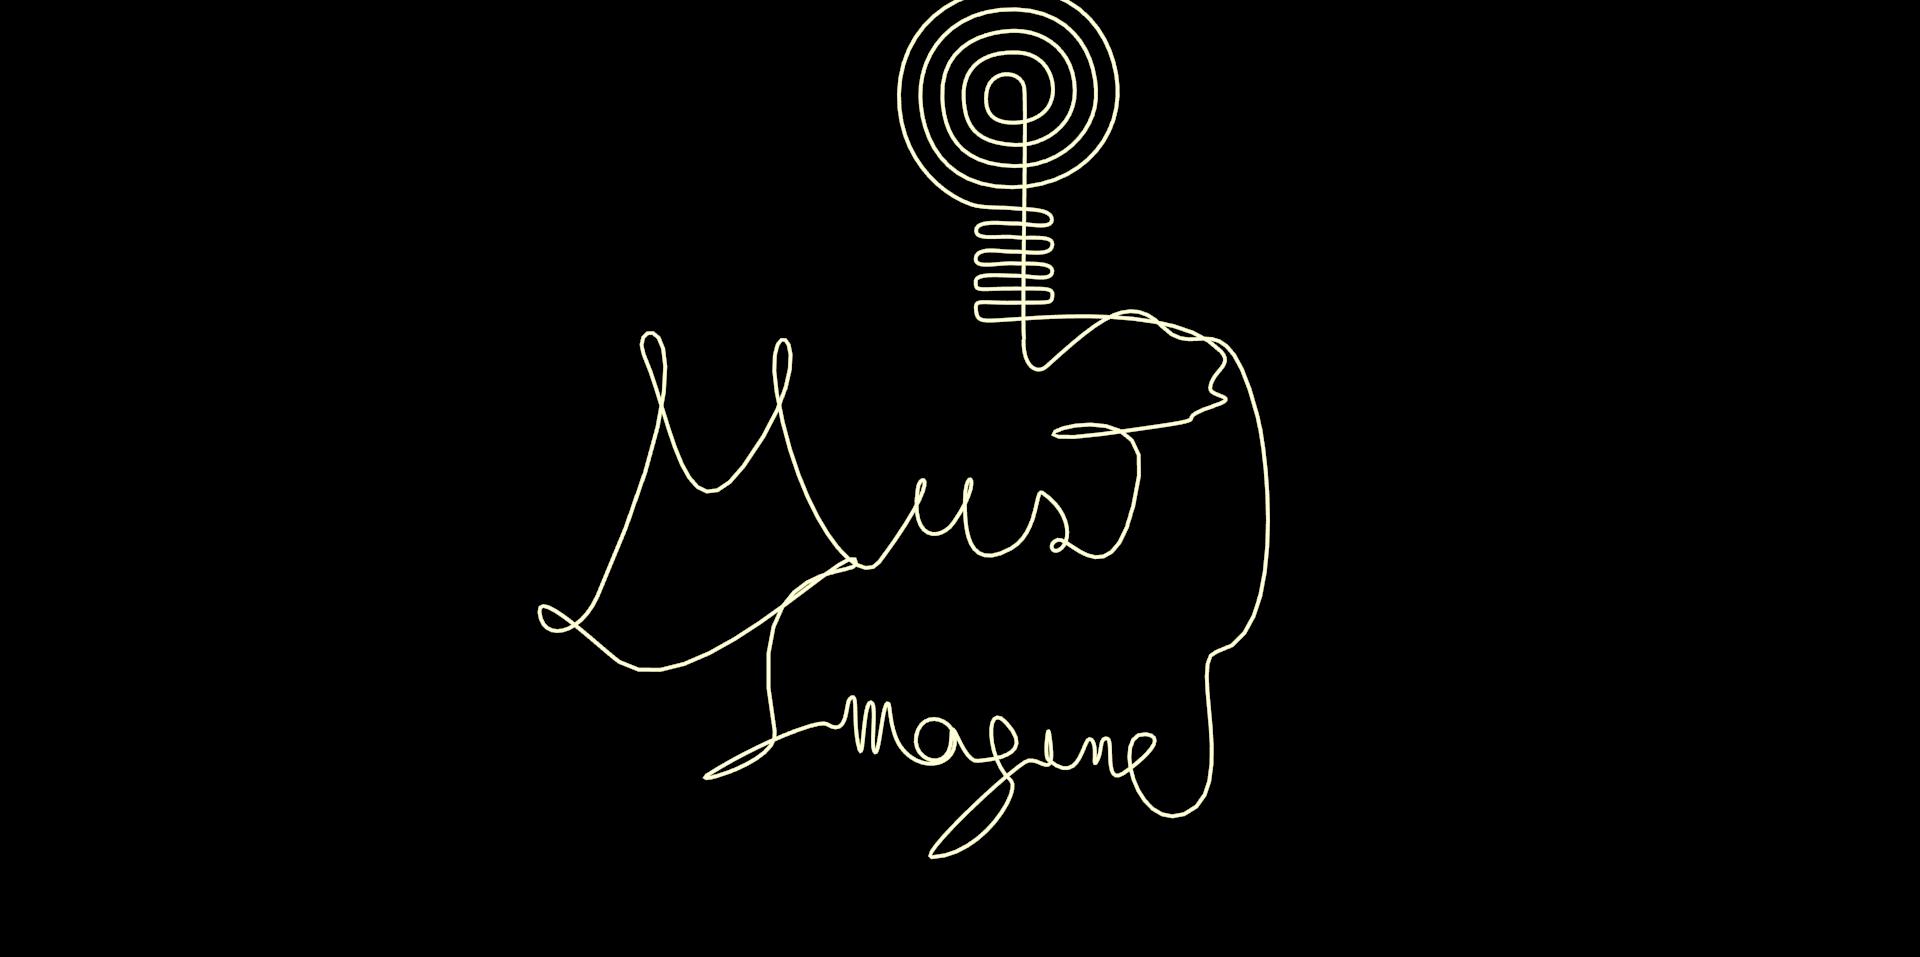 IM_intro_no_slogan_F.png